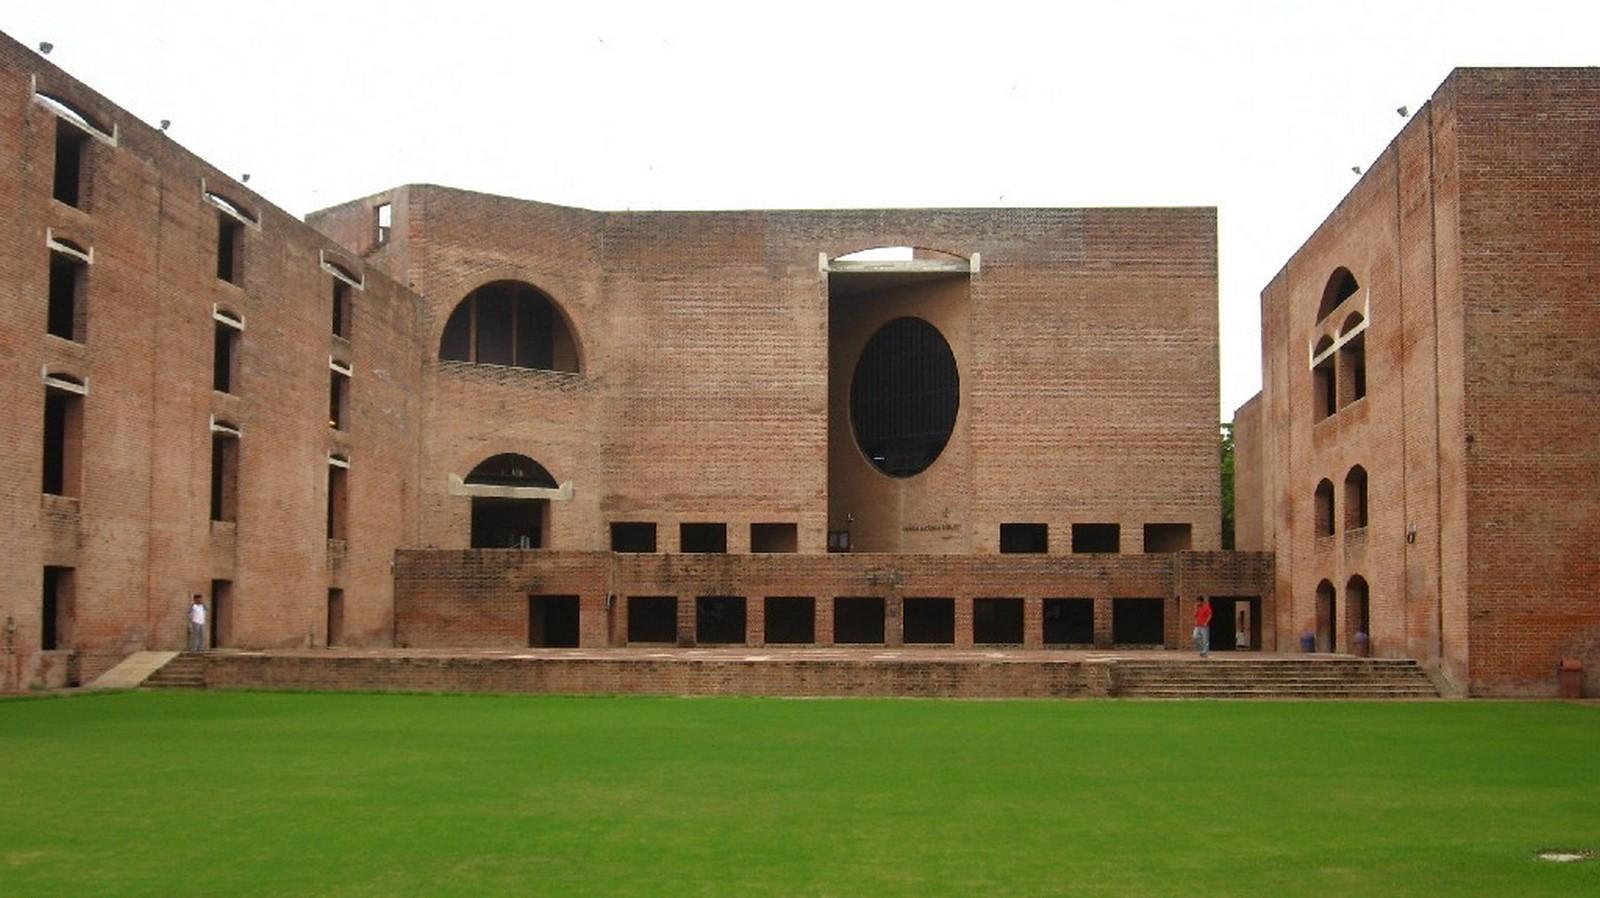 Restoration of Vikram Sarabhai Library at IIM Ahmedabad by Somaya and Kalappa Consultants Pvt. Ltd.: Finest Restoration - Sheet1